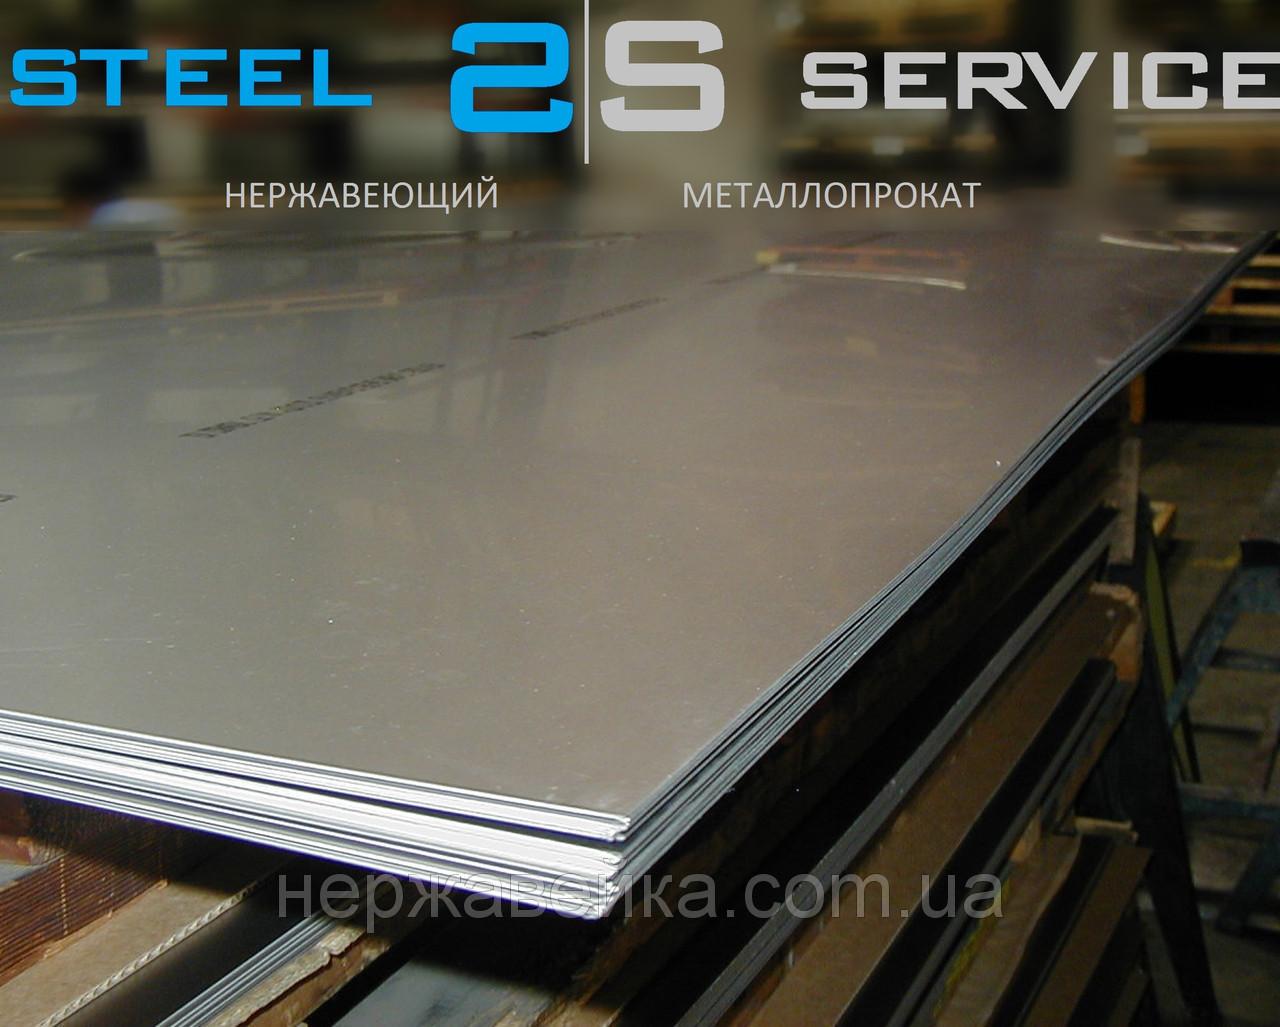 Нержавейка лист 10х1500х6000мм AISI 410S(08Х13) F1 - горячекатанный, технический